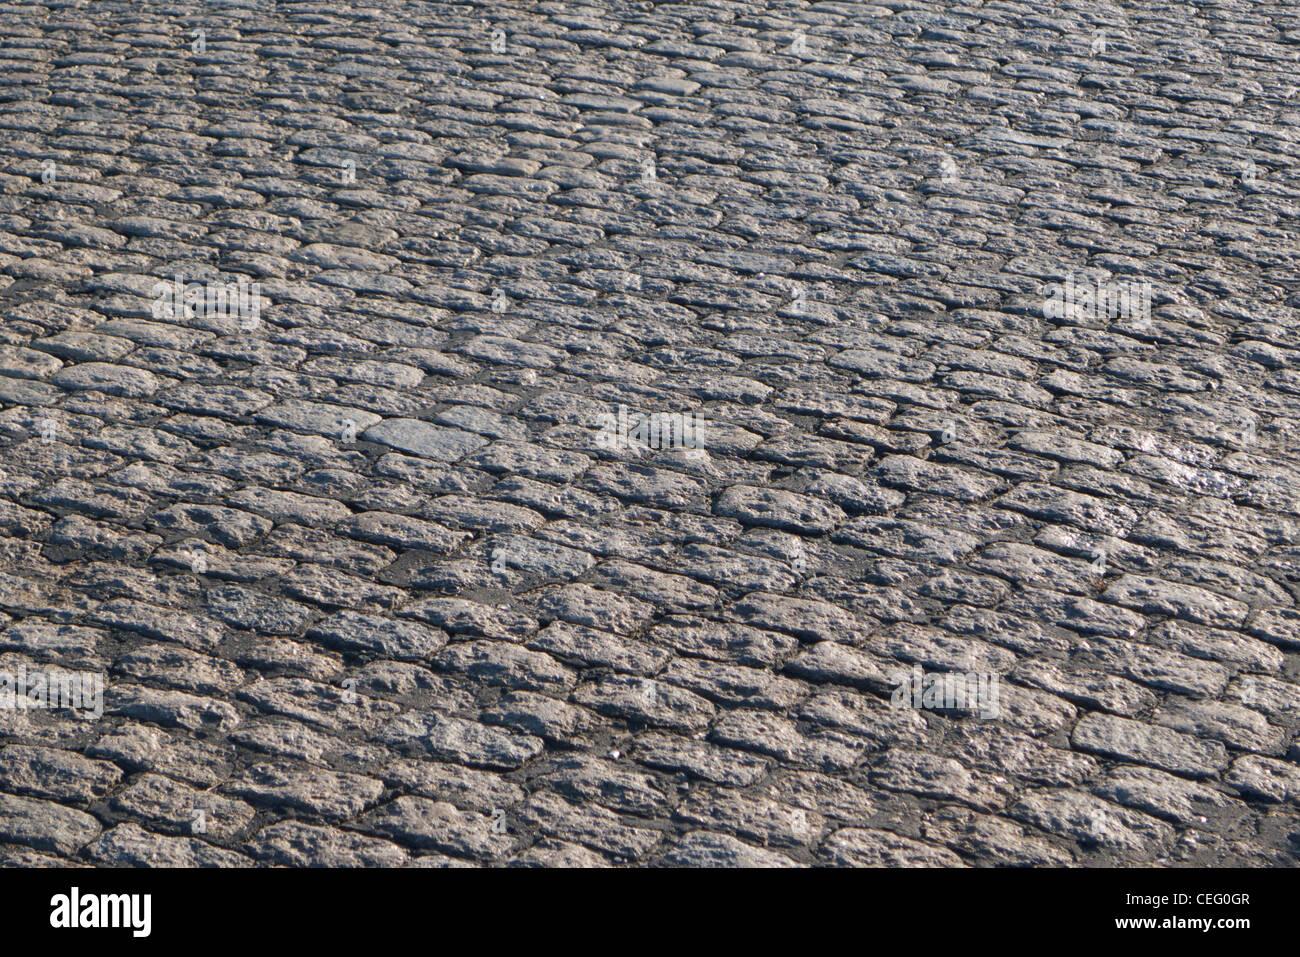 Cobblestone street surface, Red Hook, Brooklyn, USA - Stock Image